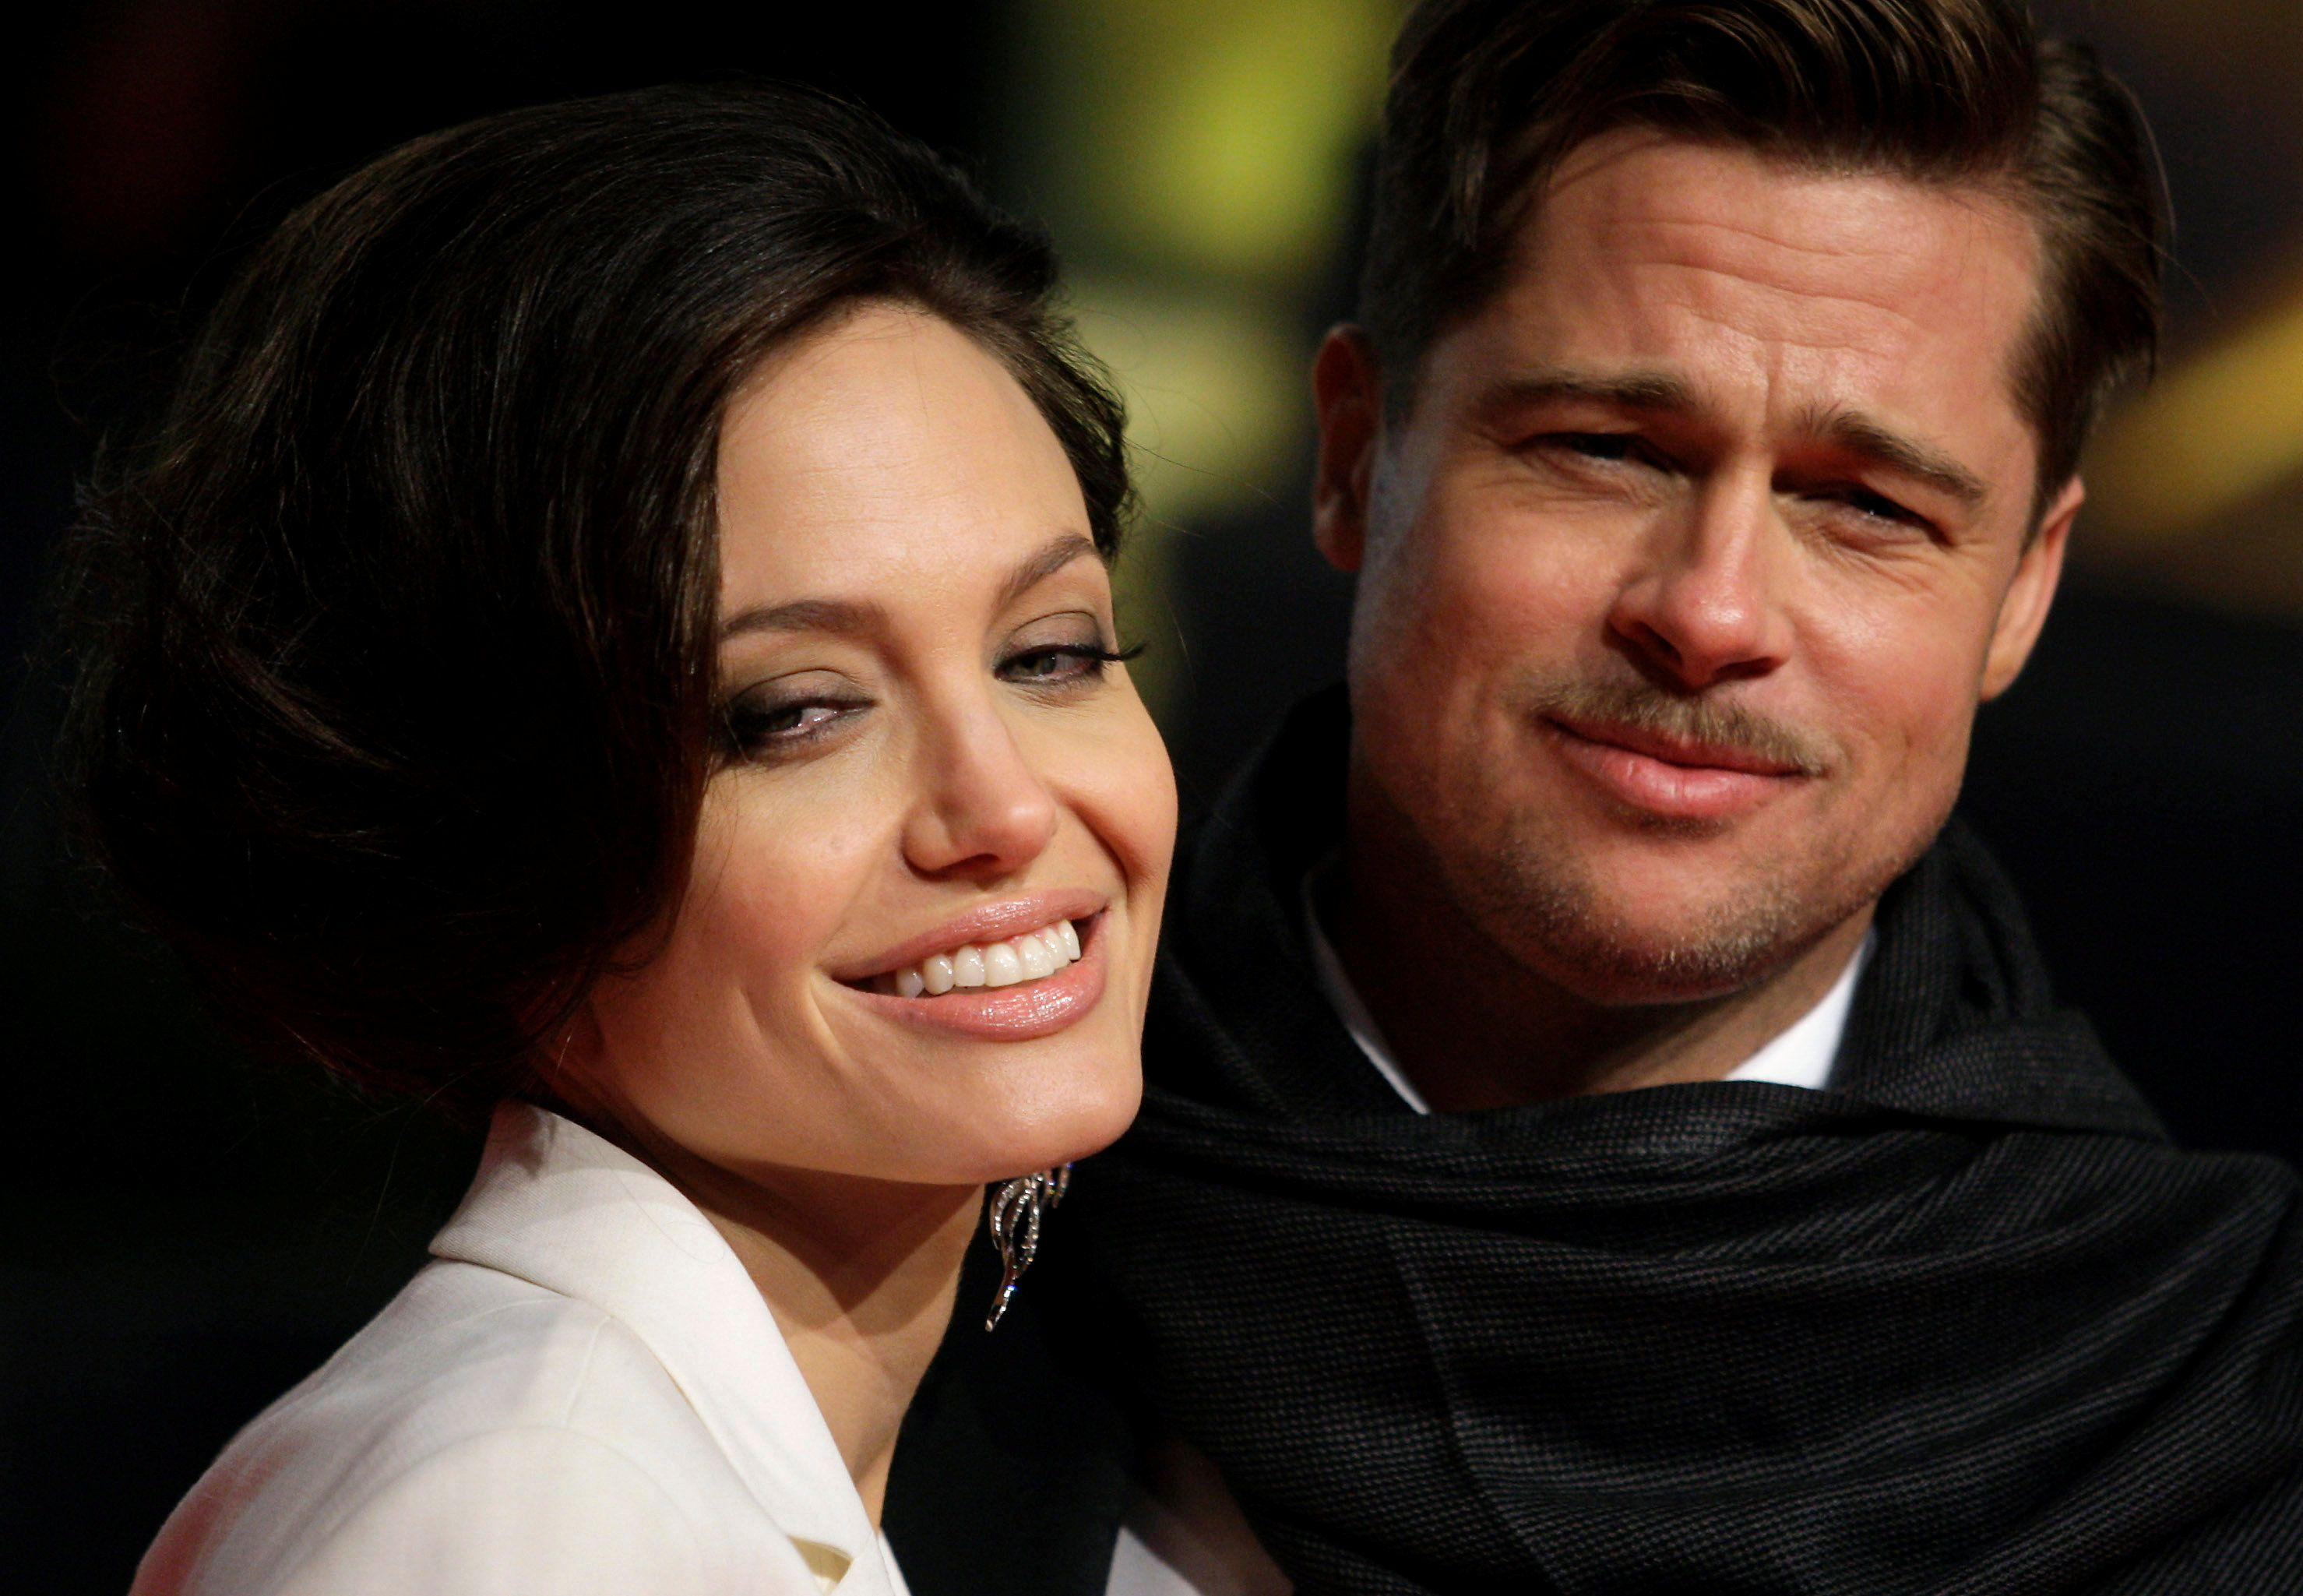 Анджелина Джоли обиделась на Брэда Питта из-за его слова о неудачном браке